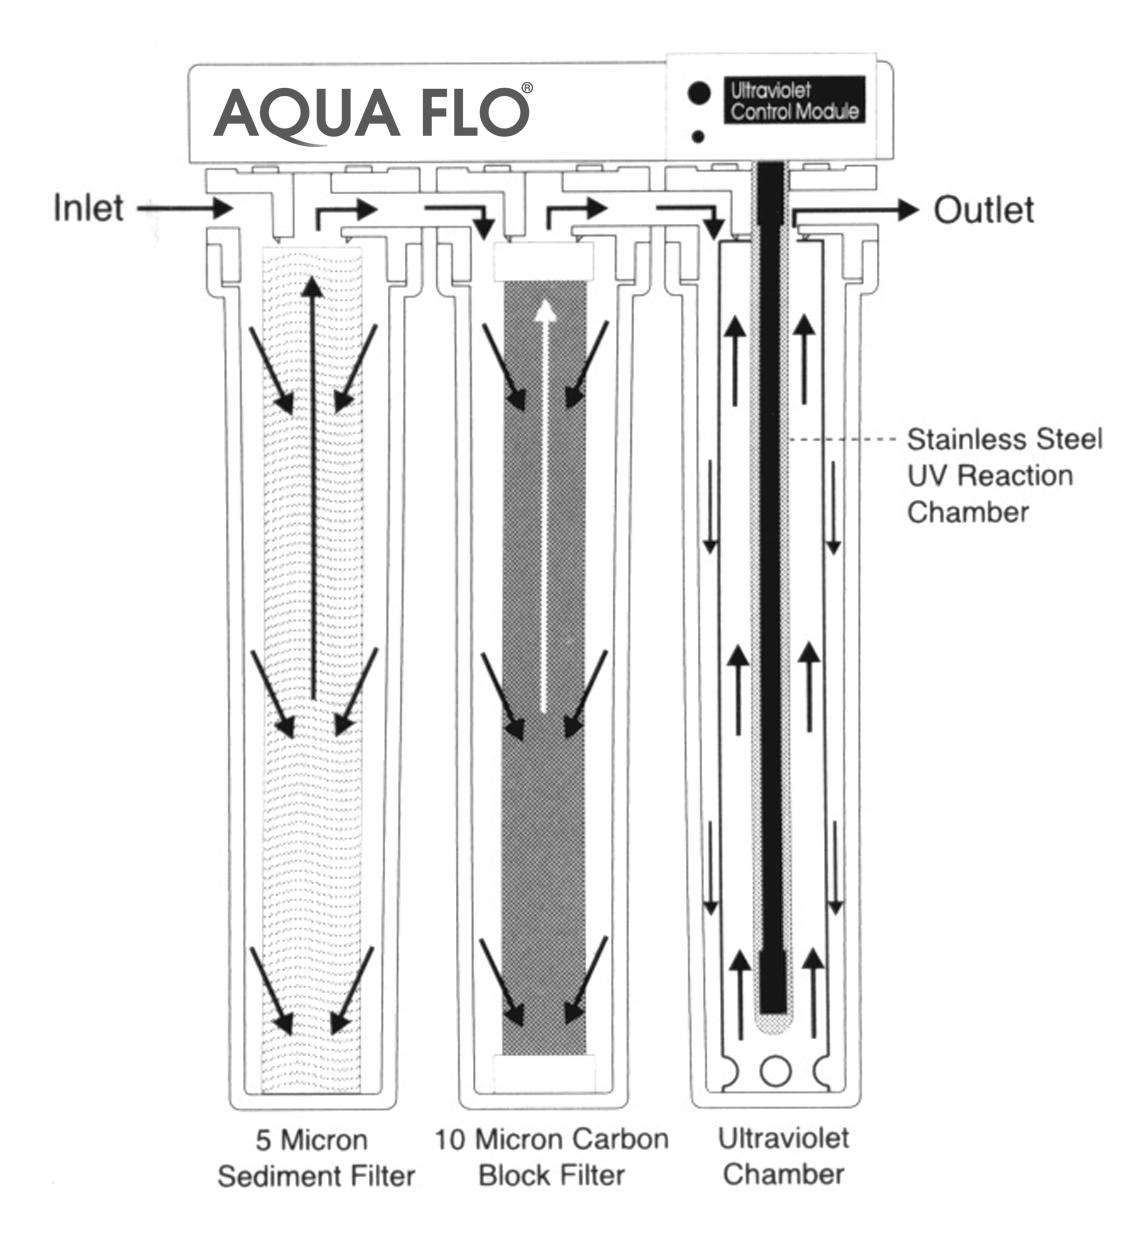 Aqua Flo_UV20_Cutaway2.jpg